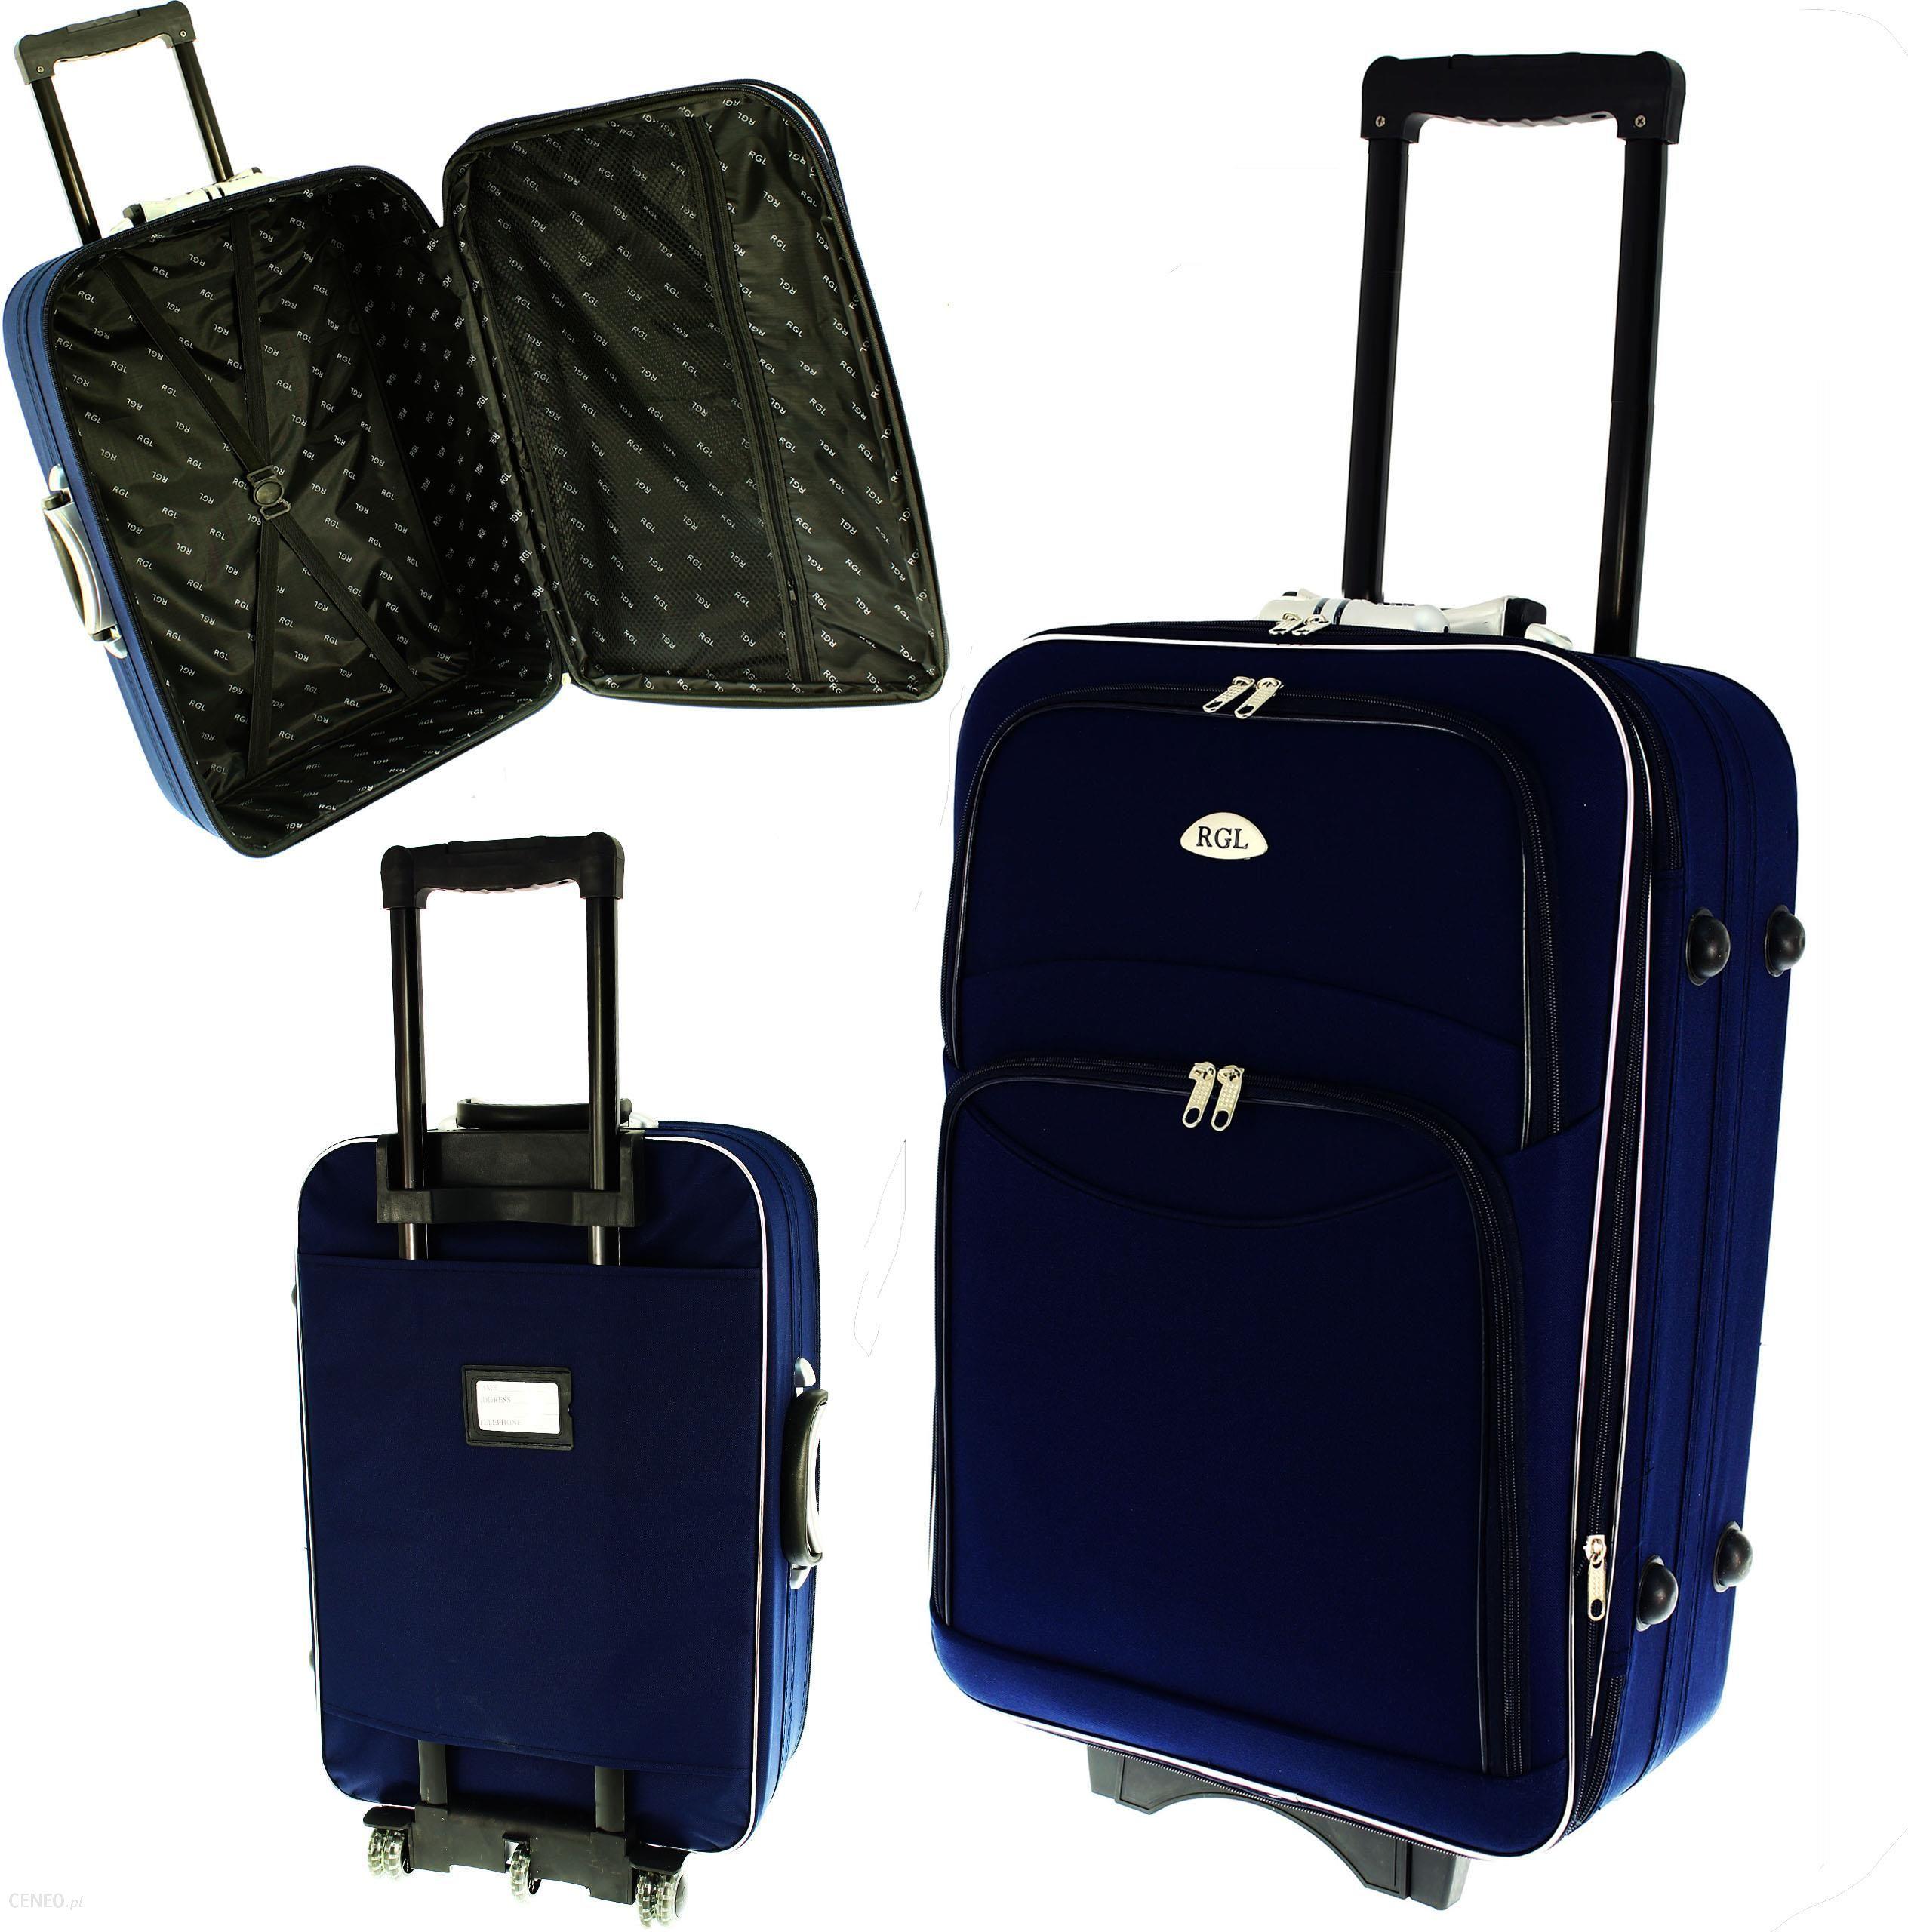 7cc15e804e63 773 Rgl Walizka podróżna mała na kółkach 55x40x20 - Ceny i opinie ...